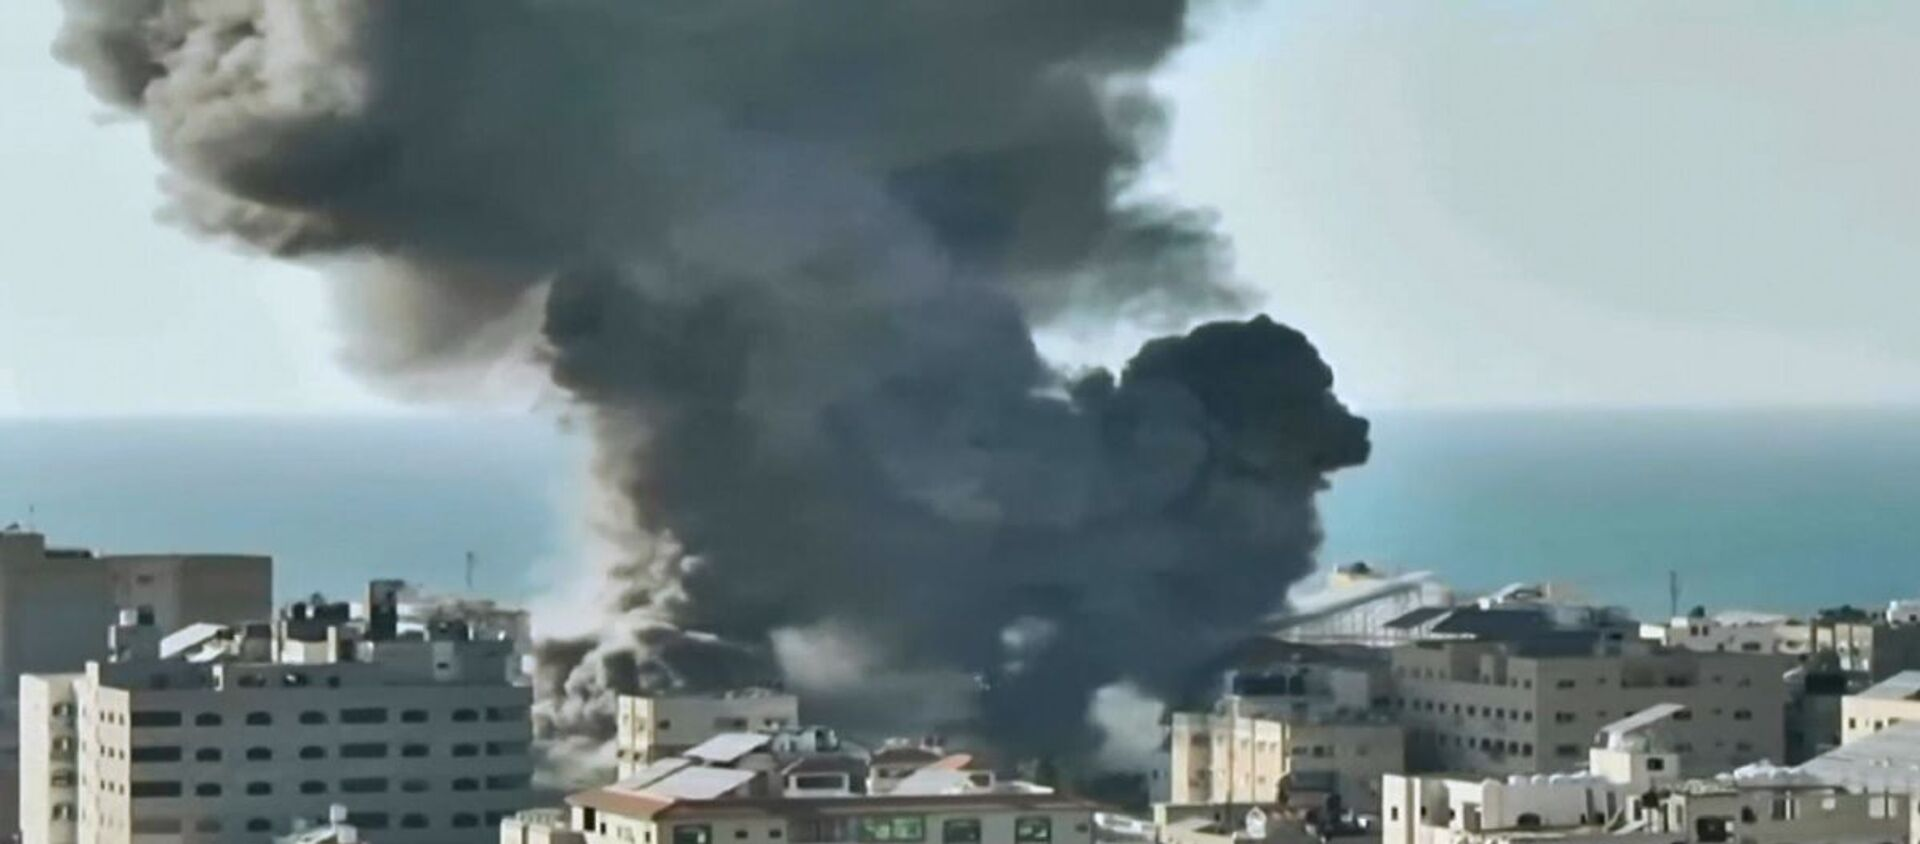 Attacchi aerei israeliani distruggono una banca a Gaza - Sputnik Italia, 1920, 15.05.2021